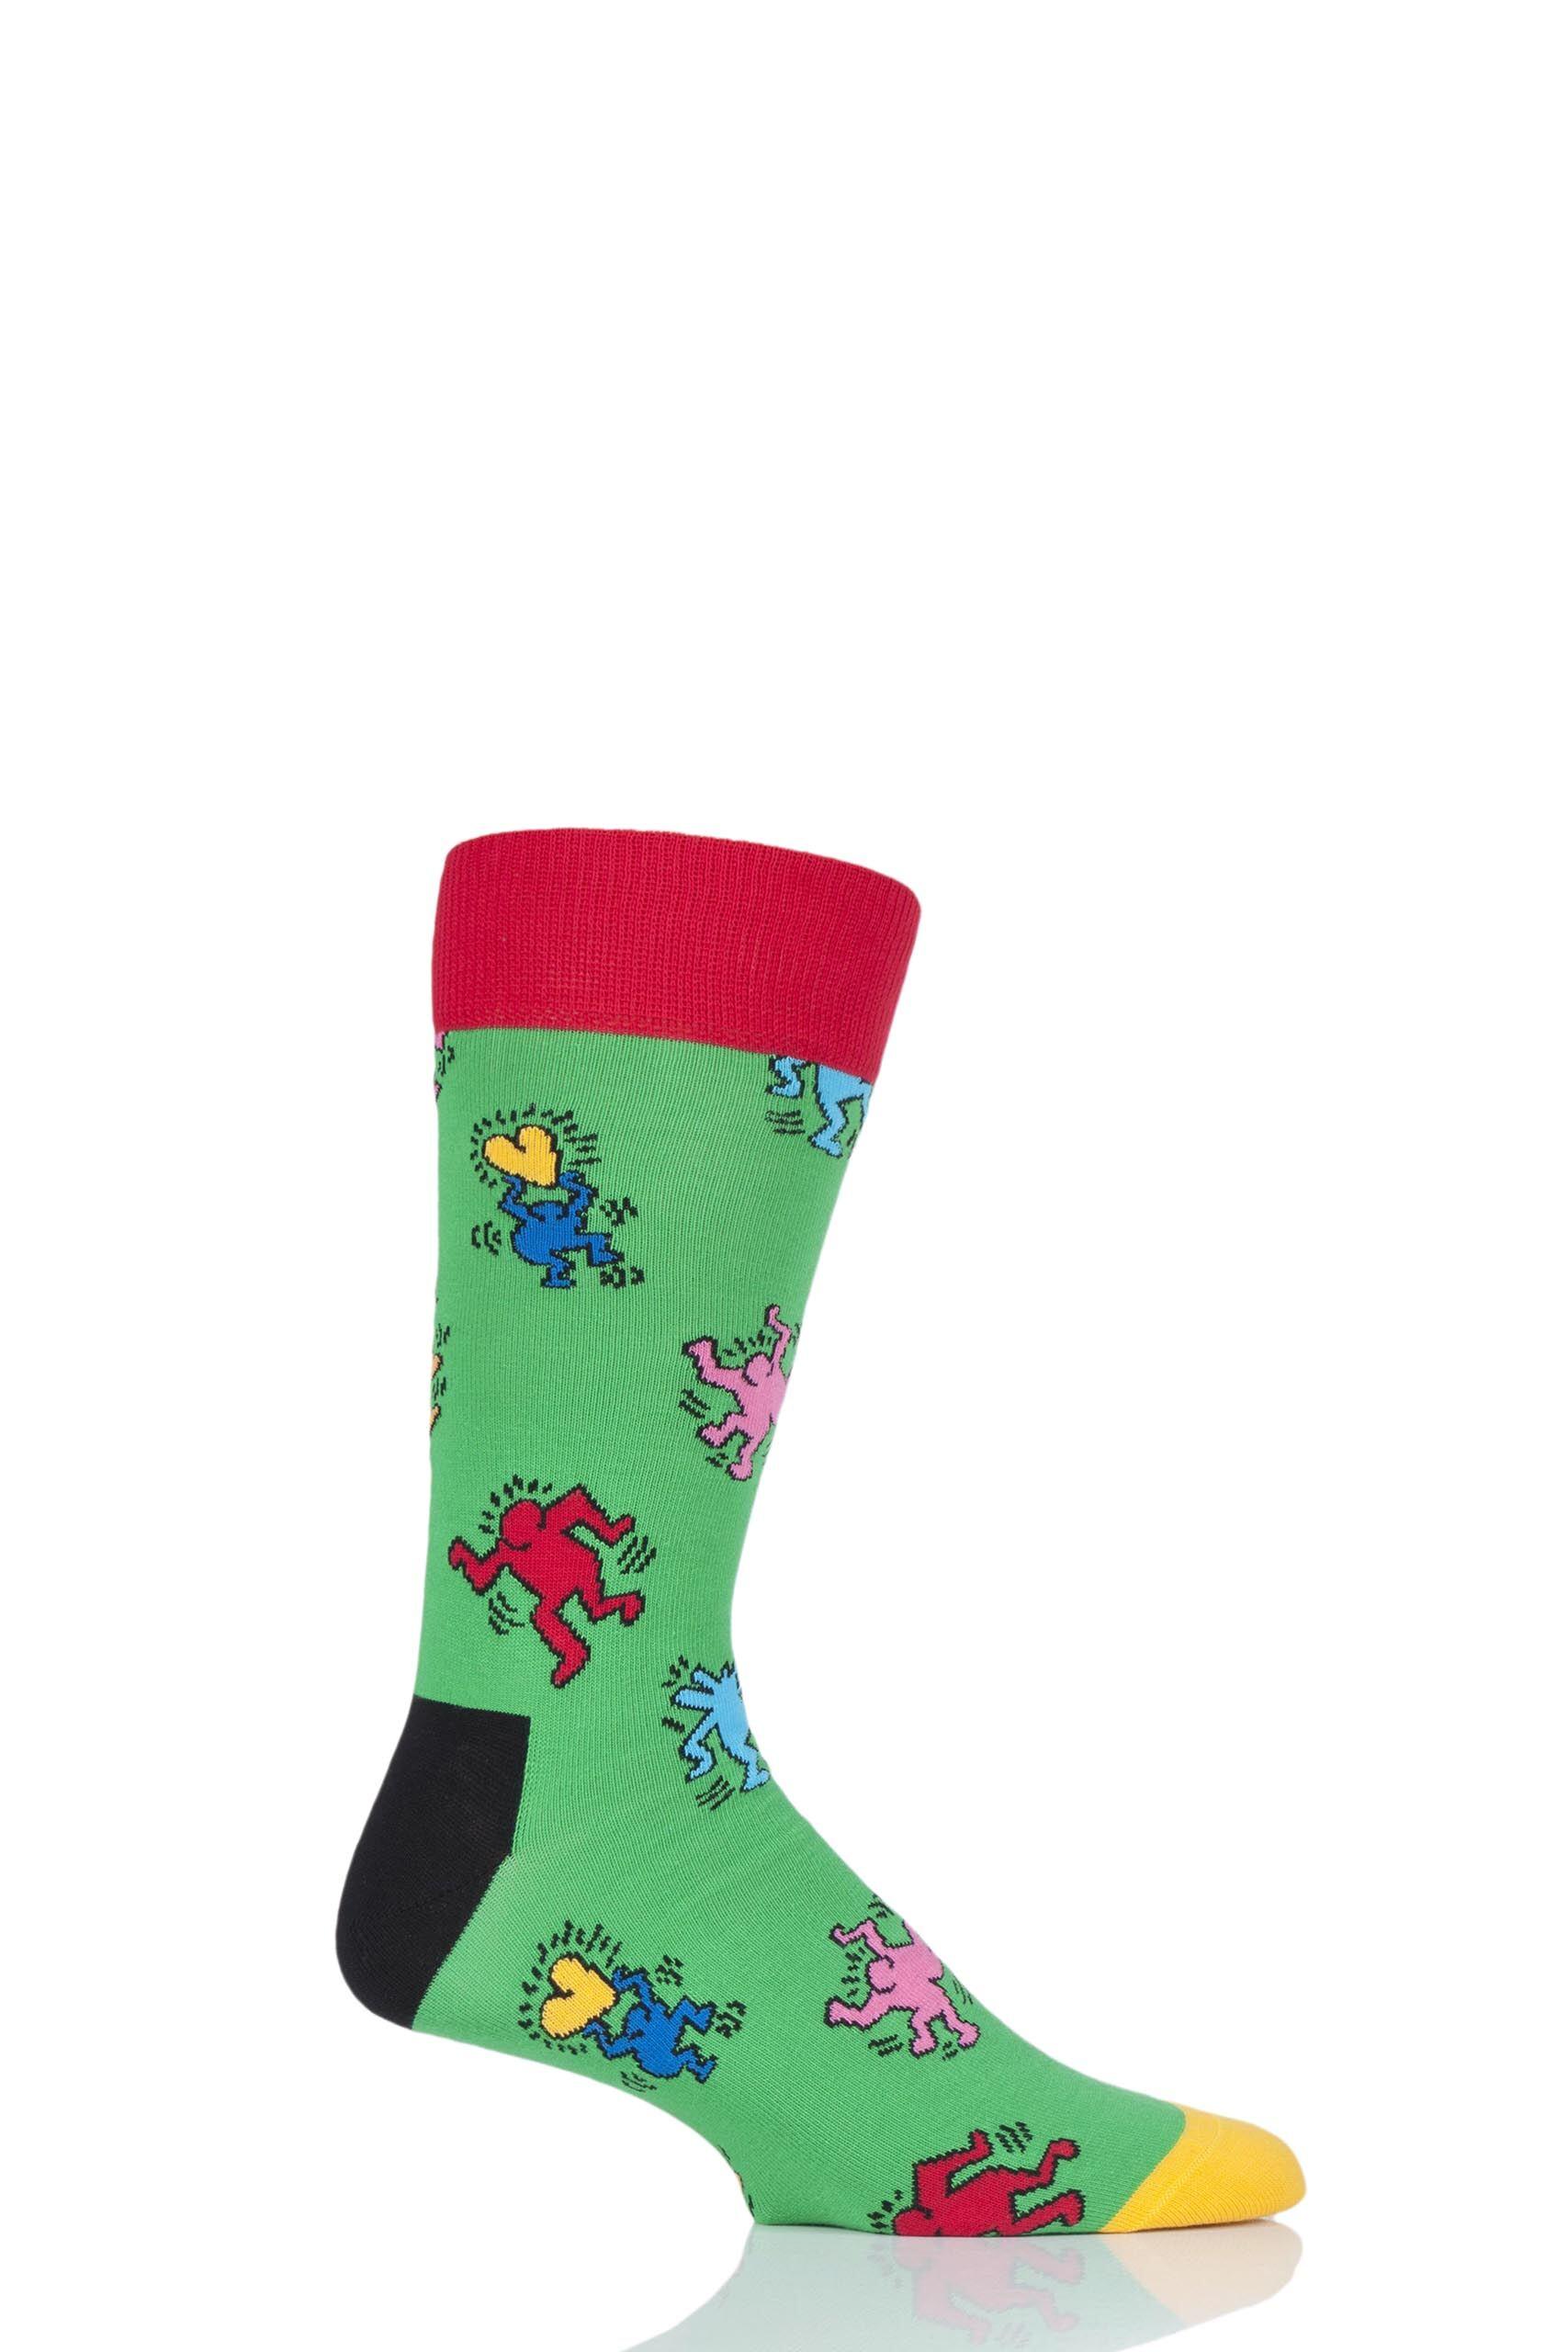 Image of 1 Pair Assorted Keith Haring Dancing Socks Unisex 4-7 Unisex - Happy Socks